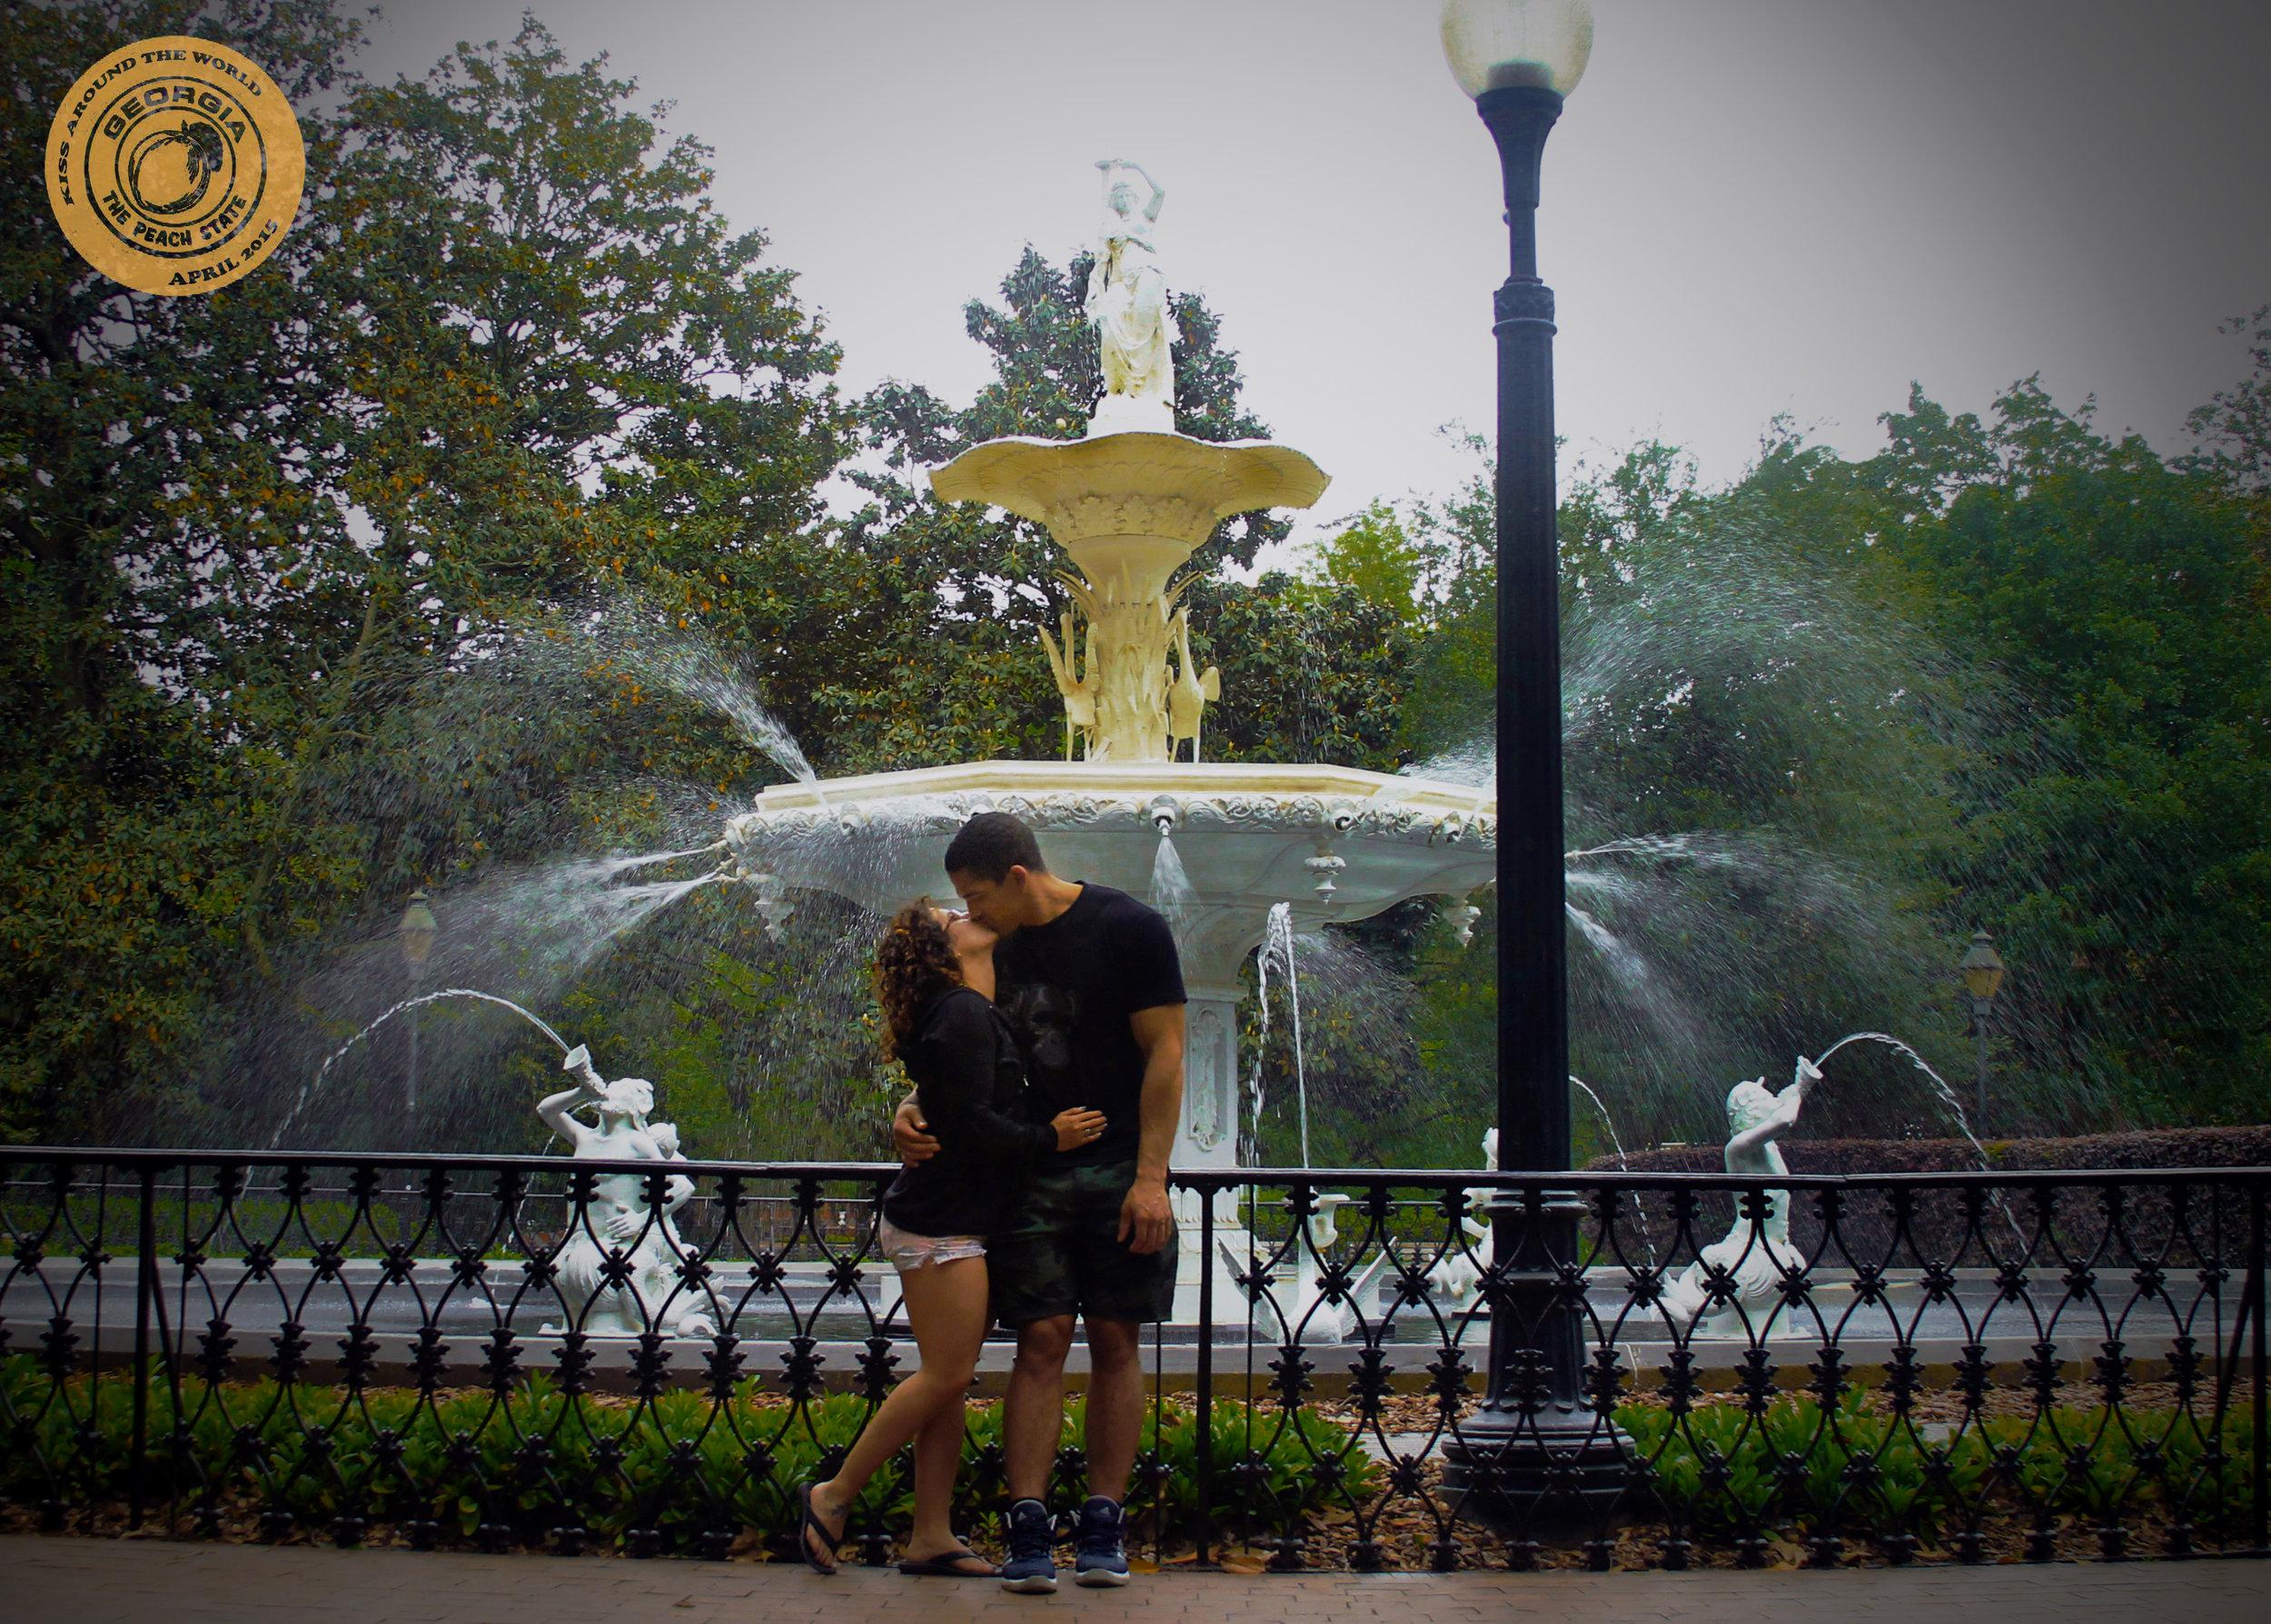 vickygood_photography_GA_travel_kiss.JPG